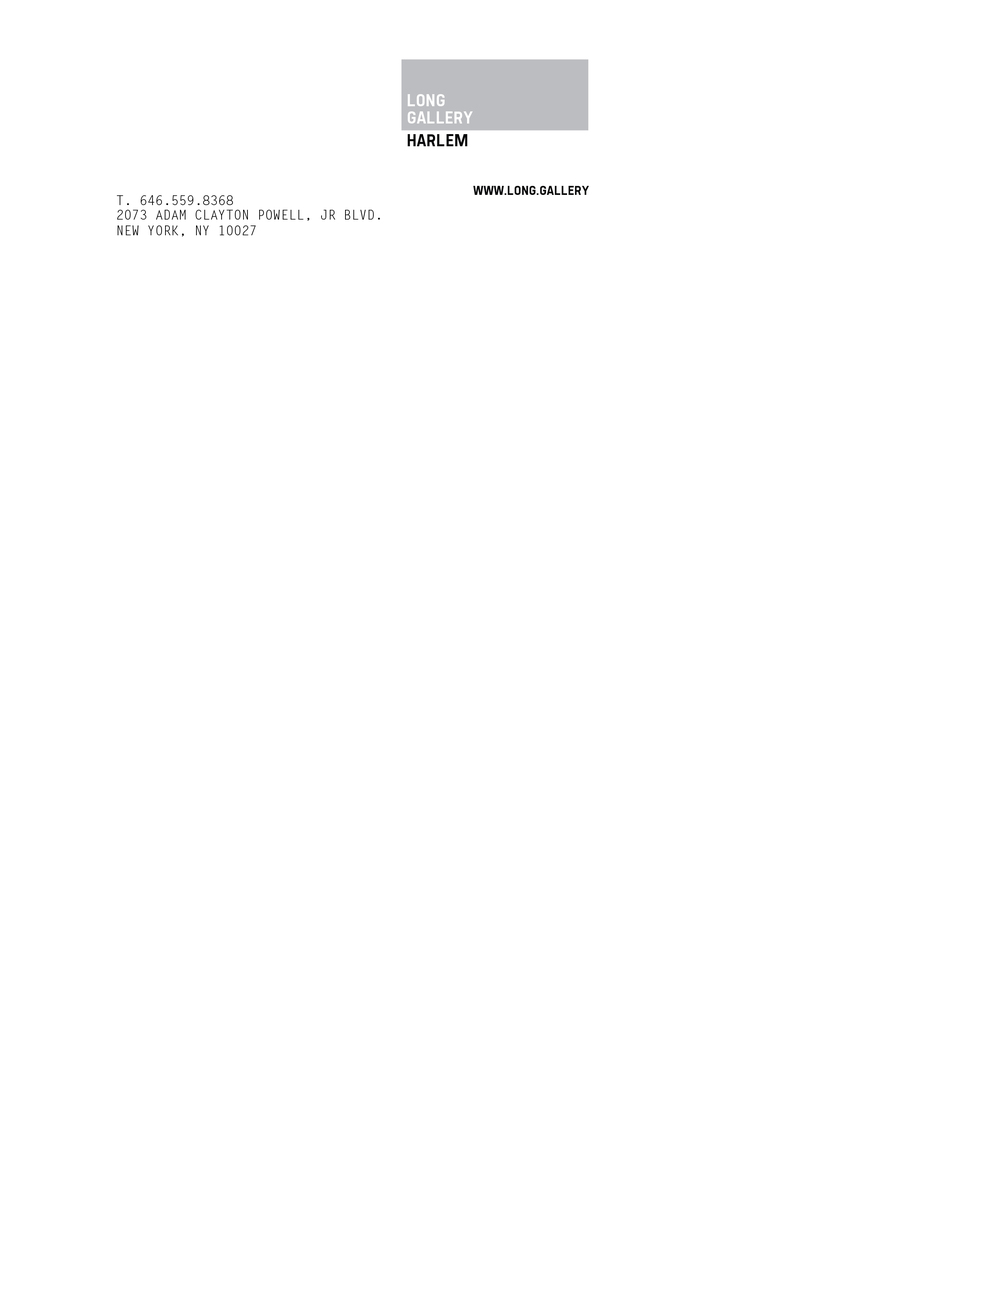 LetterHead -01.jpg